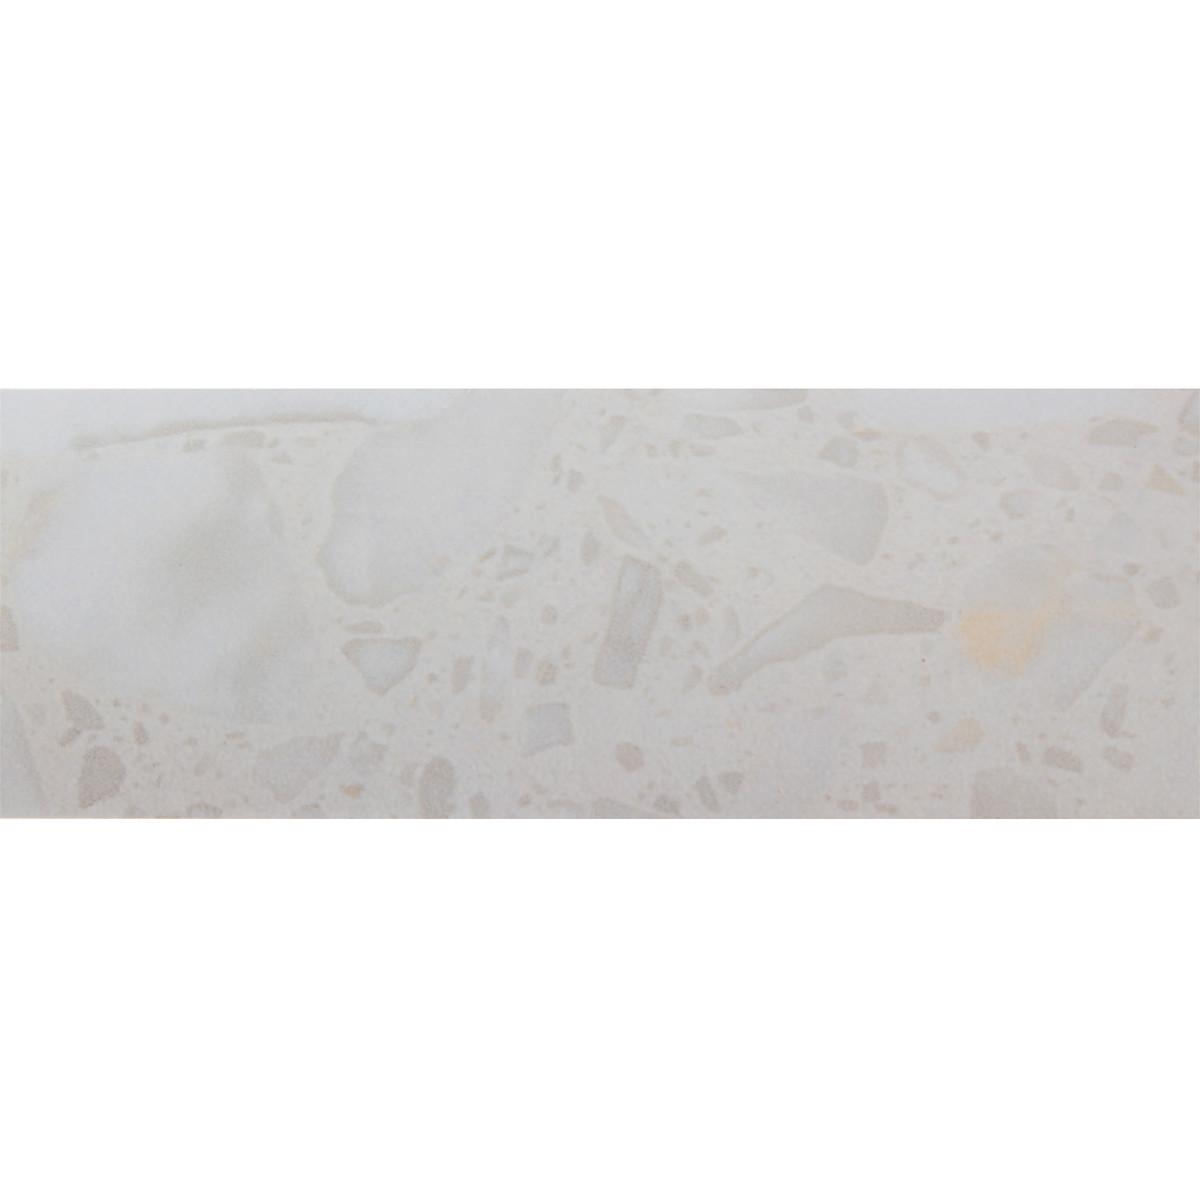 Кромка №905 С Клеем Для Плинтуса 305Х32 Цвет Белые Камушки